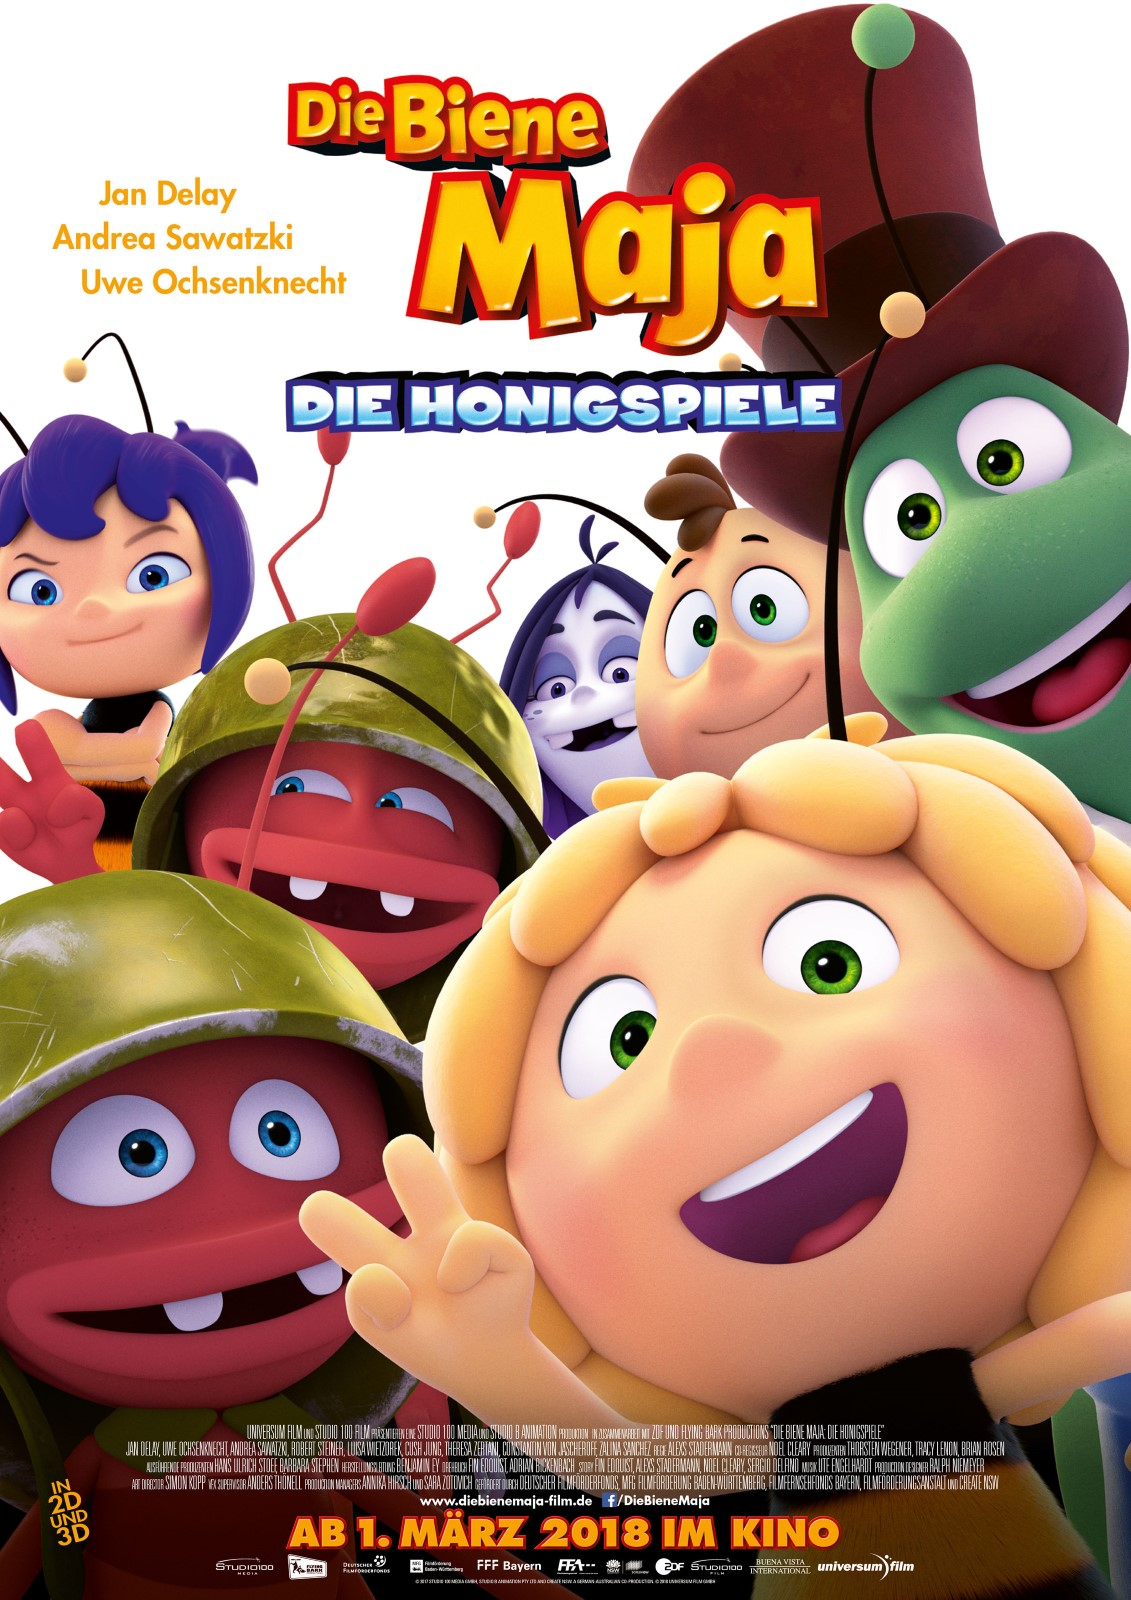 Wo kann man Die Biene Maja 2 - Die Honigspiele online streamen?